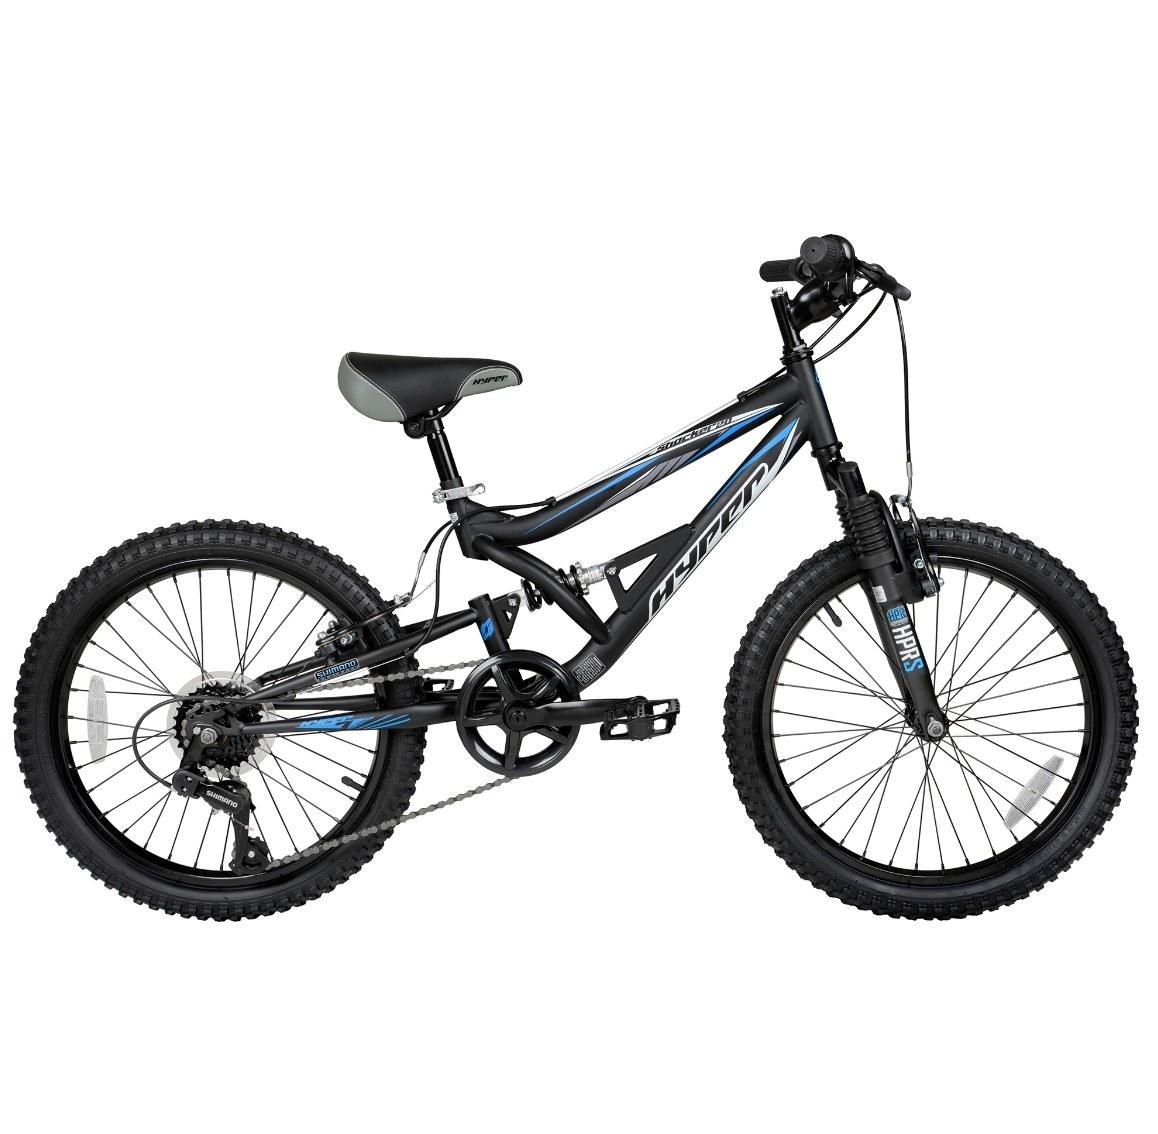 The kids mountain bike